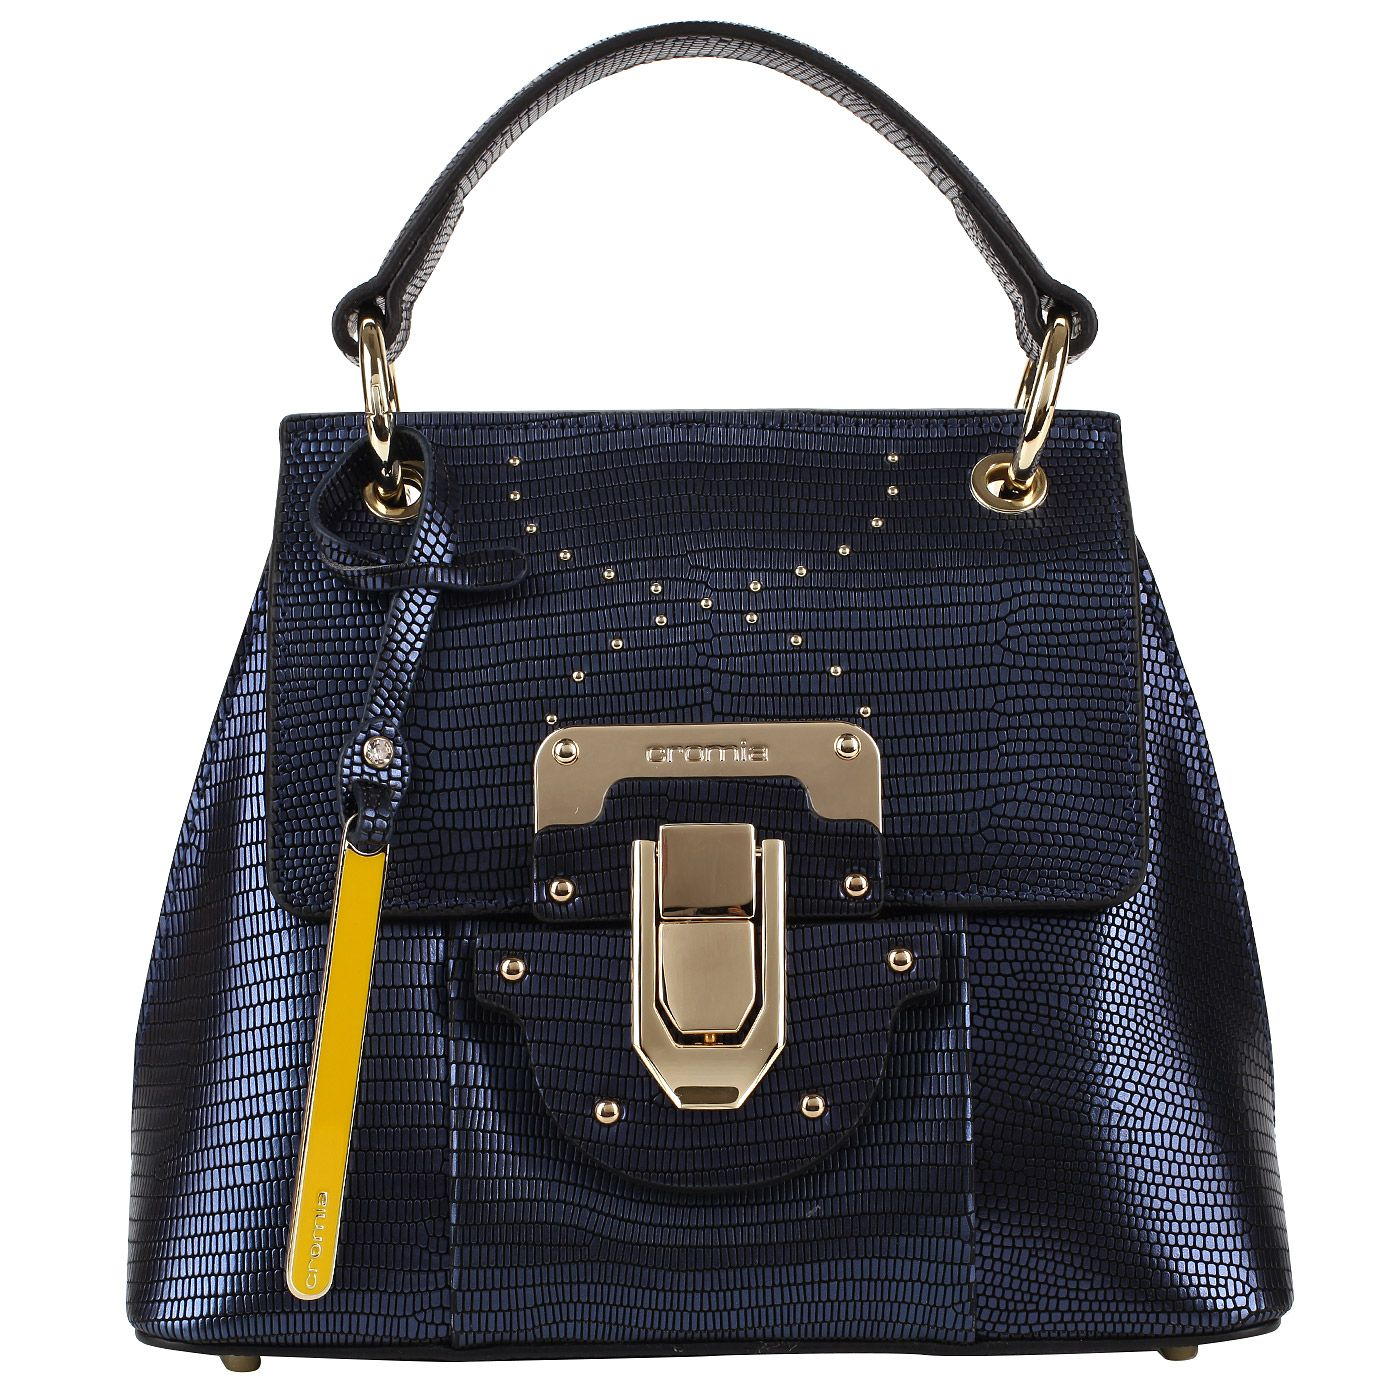 81aa16c4ffe9 Кожаная сумочка со съемным ремешком Cromia Yvon   Новинки. Сумки 2019